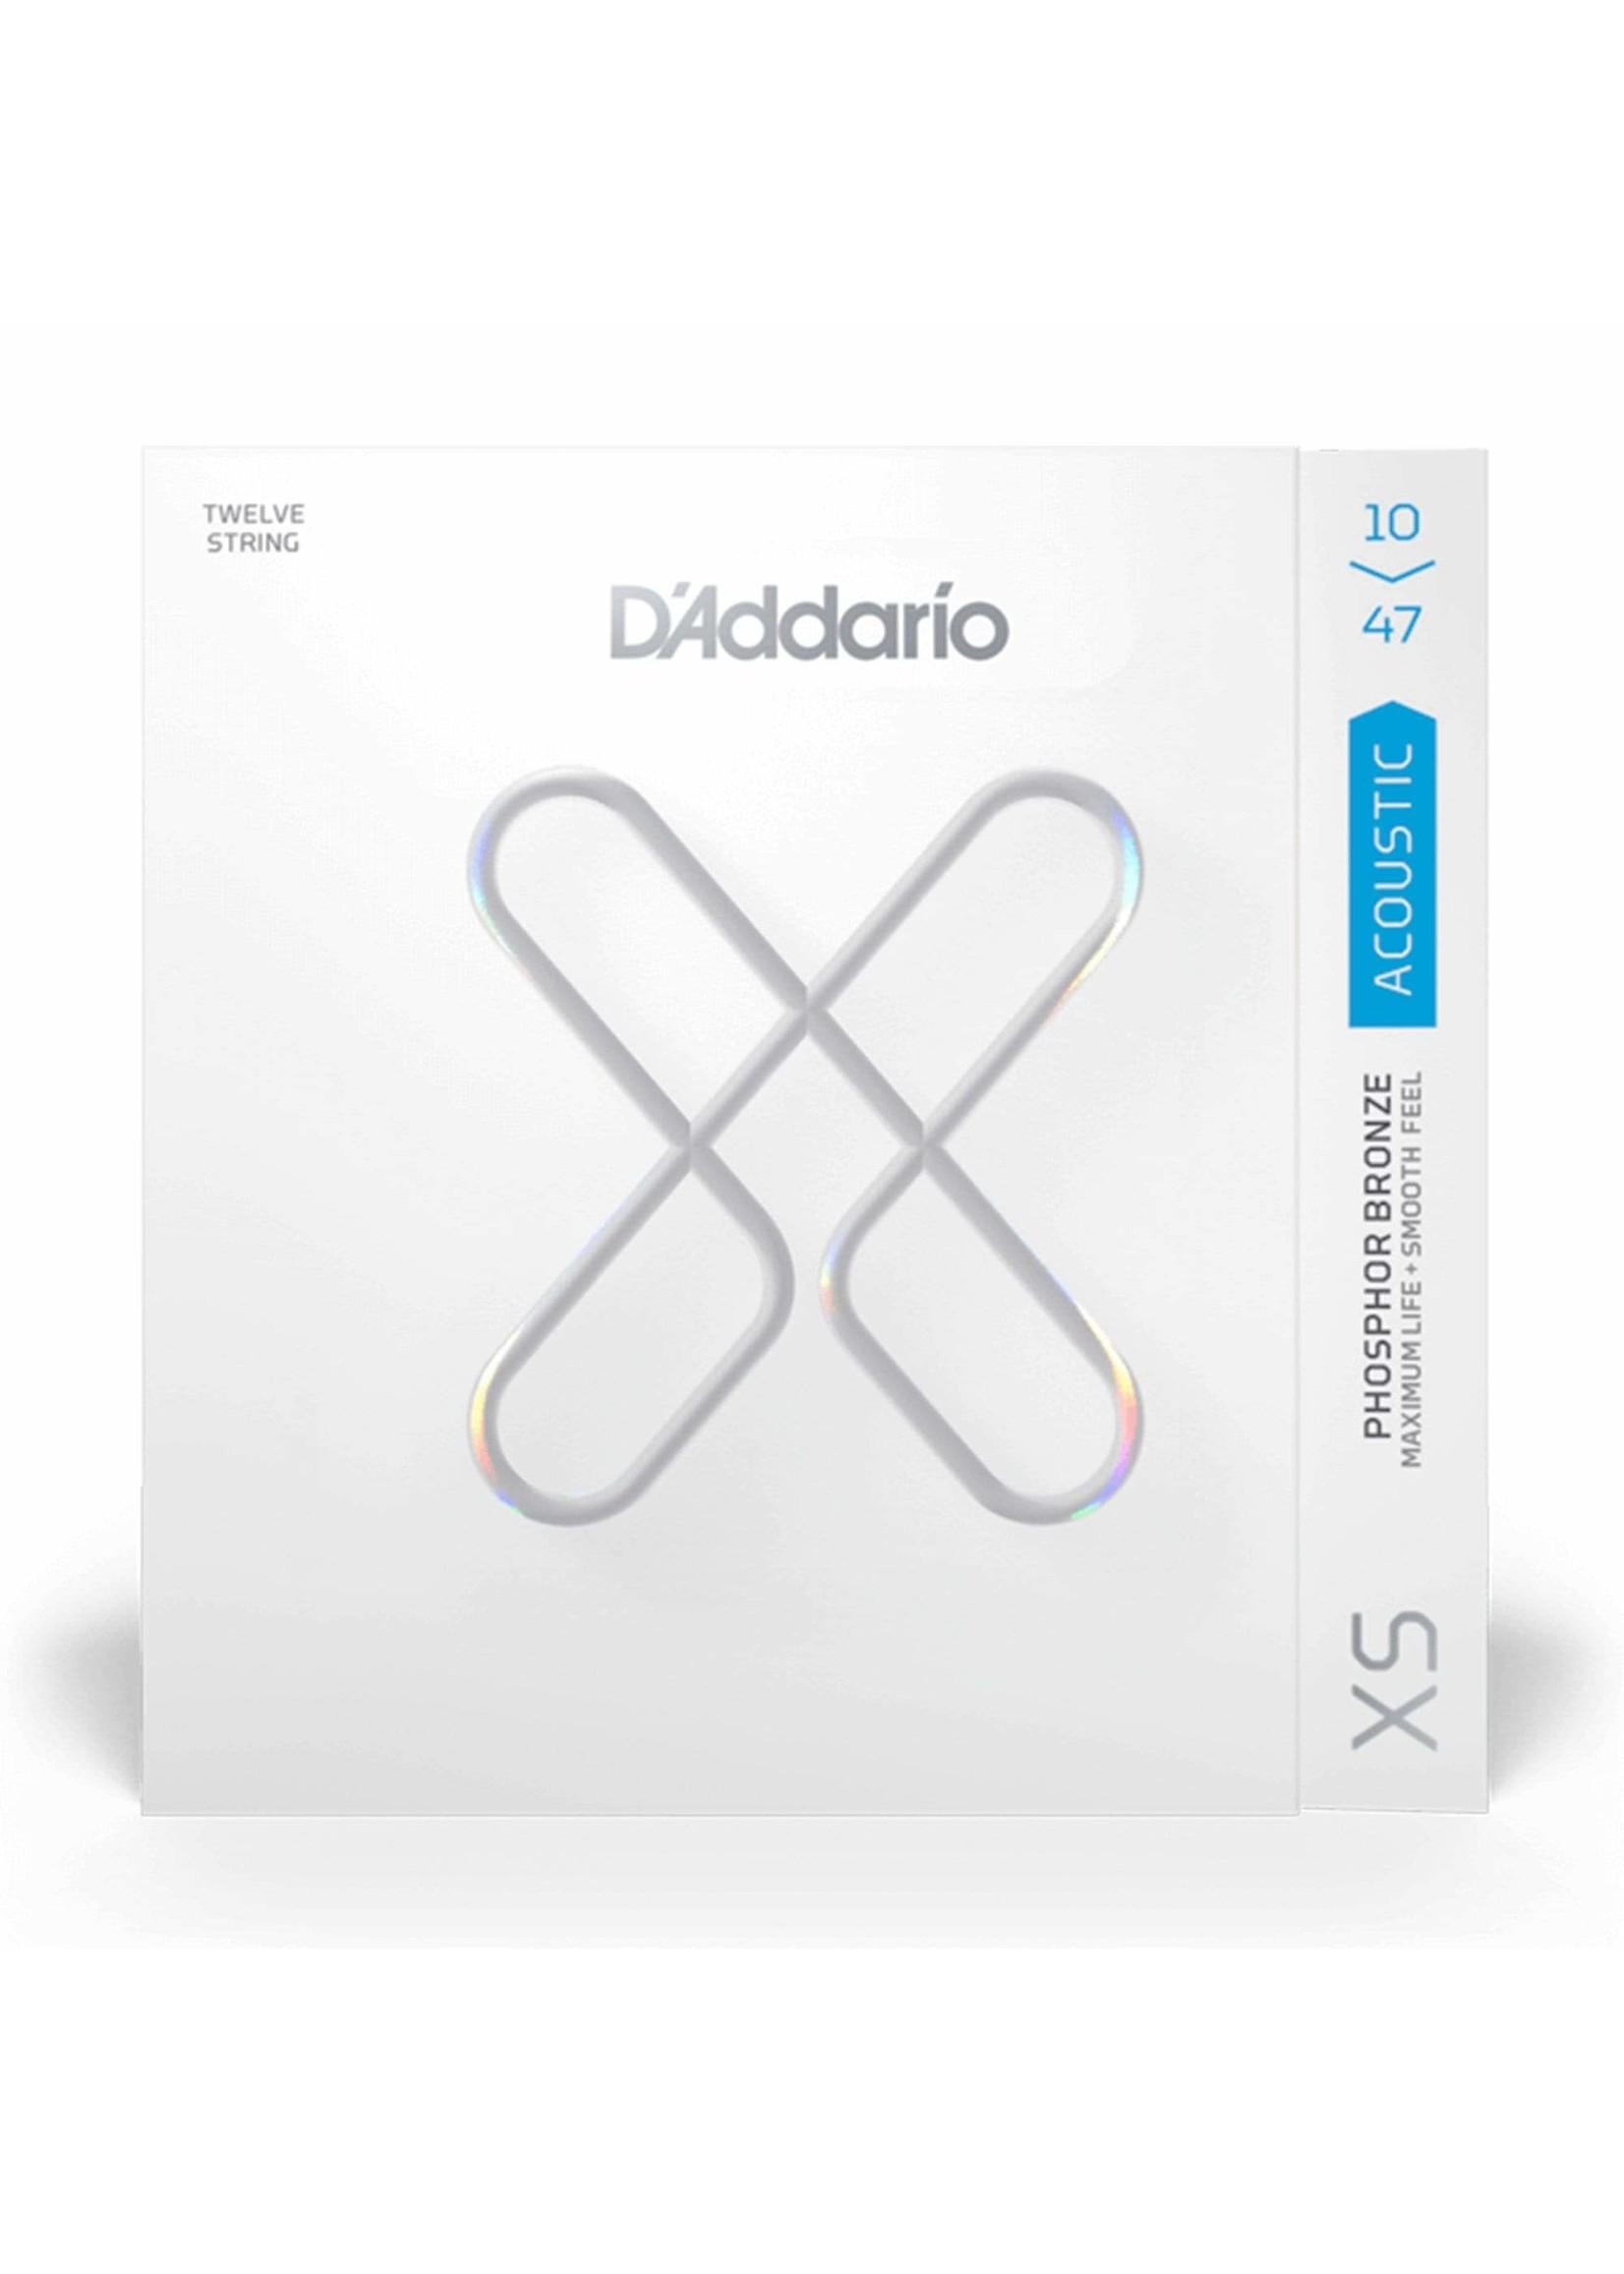 D'ADDARIO D'ADDARIO XS COATED 12 STRING SET 10-47